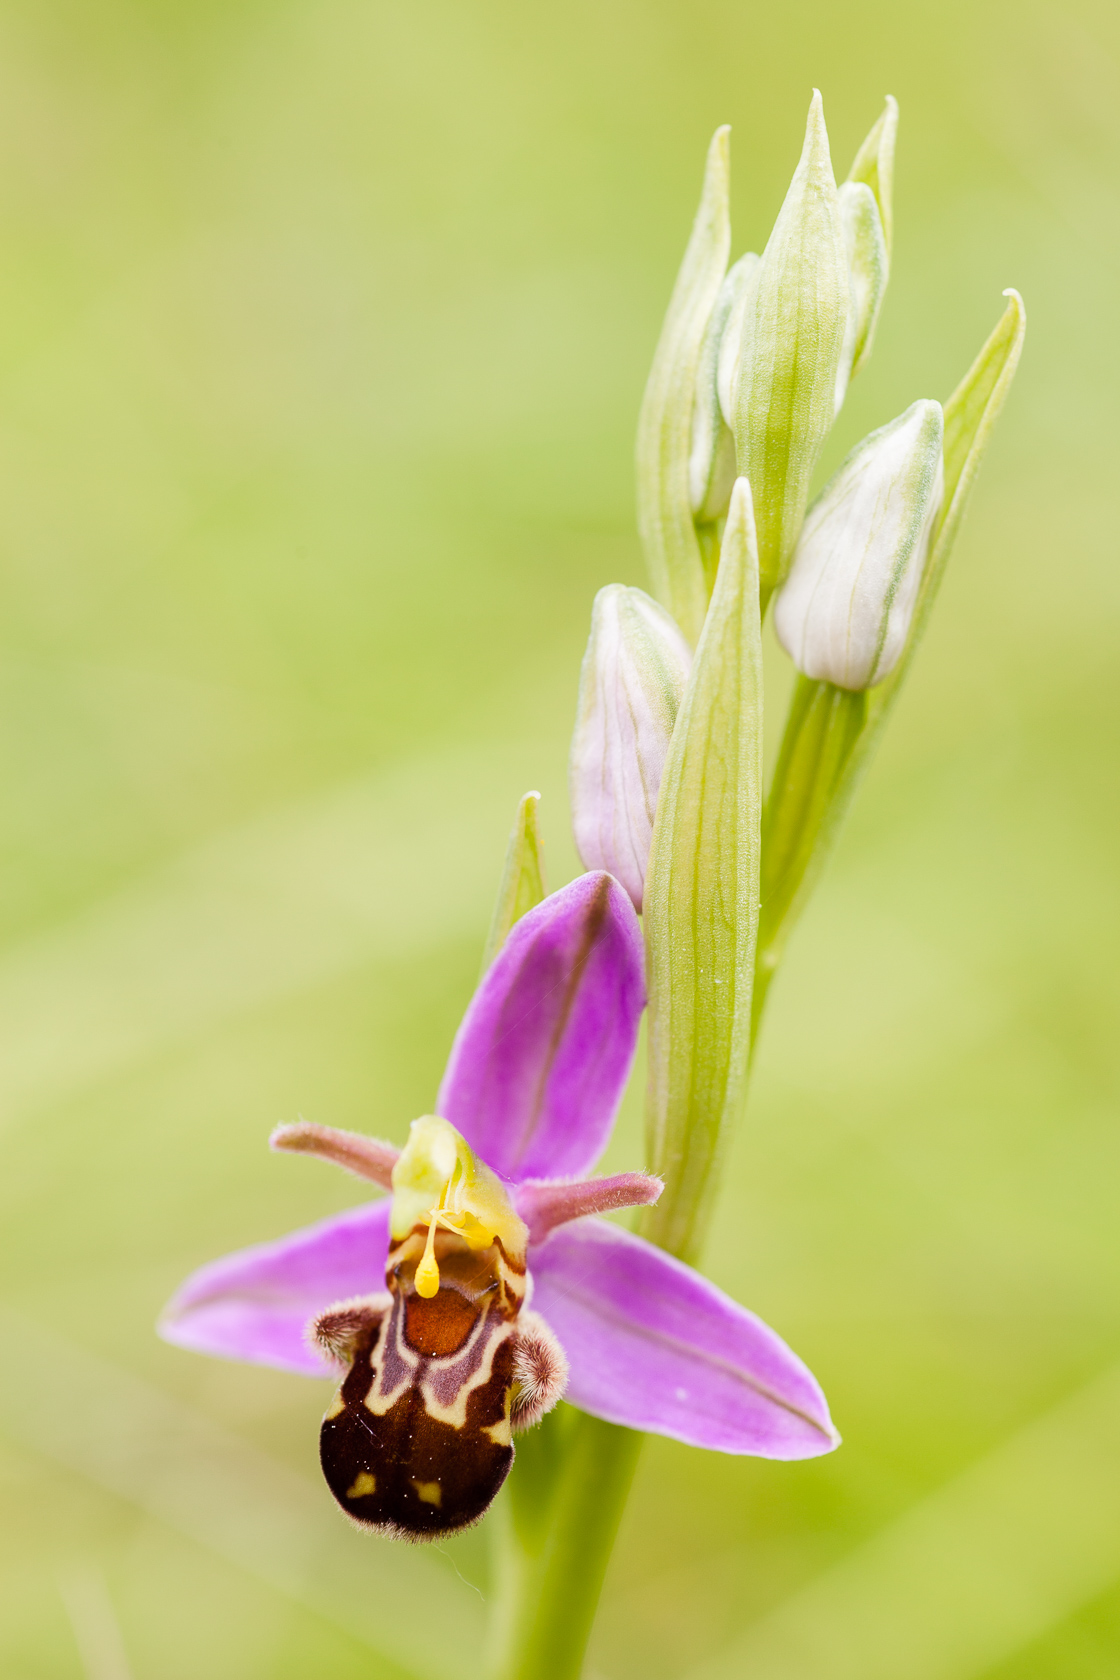 Orchidée ophrys abeille Ophrys apifera var aurita